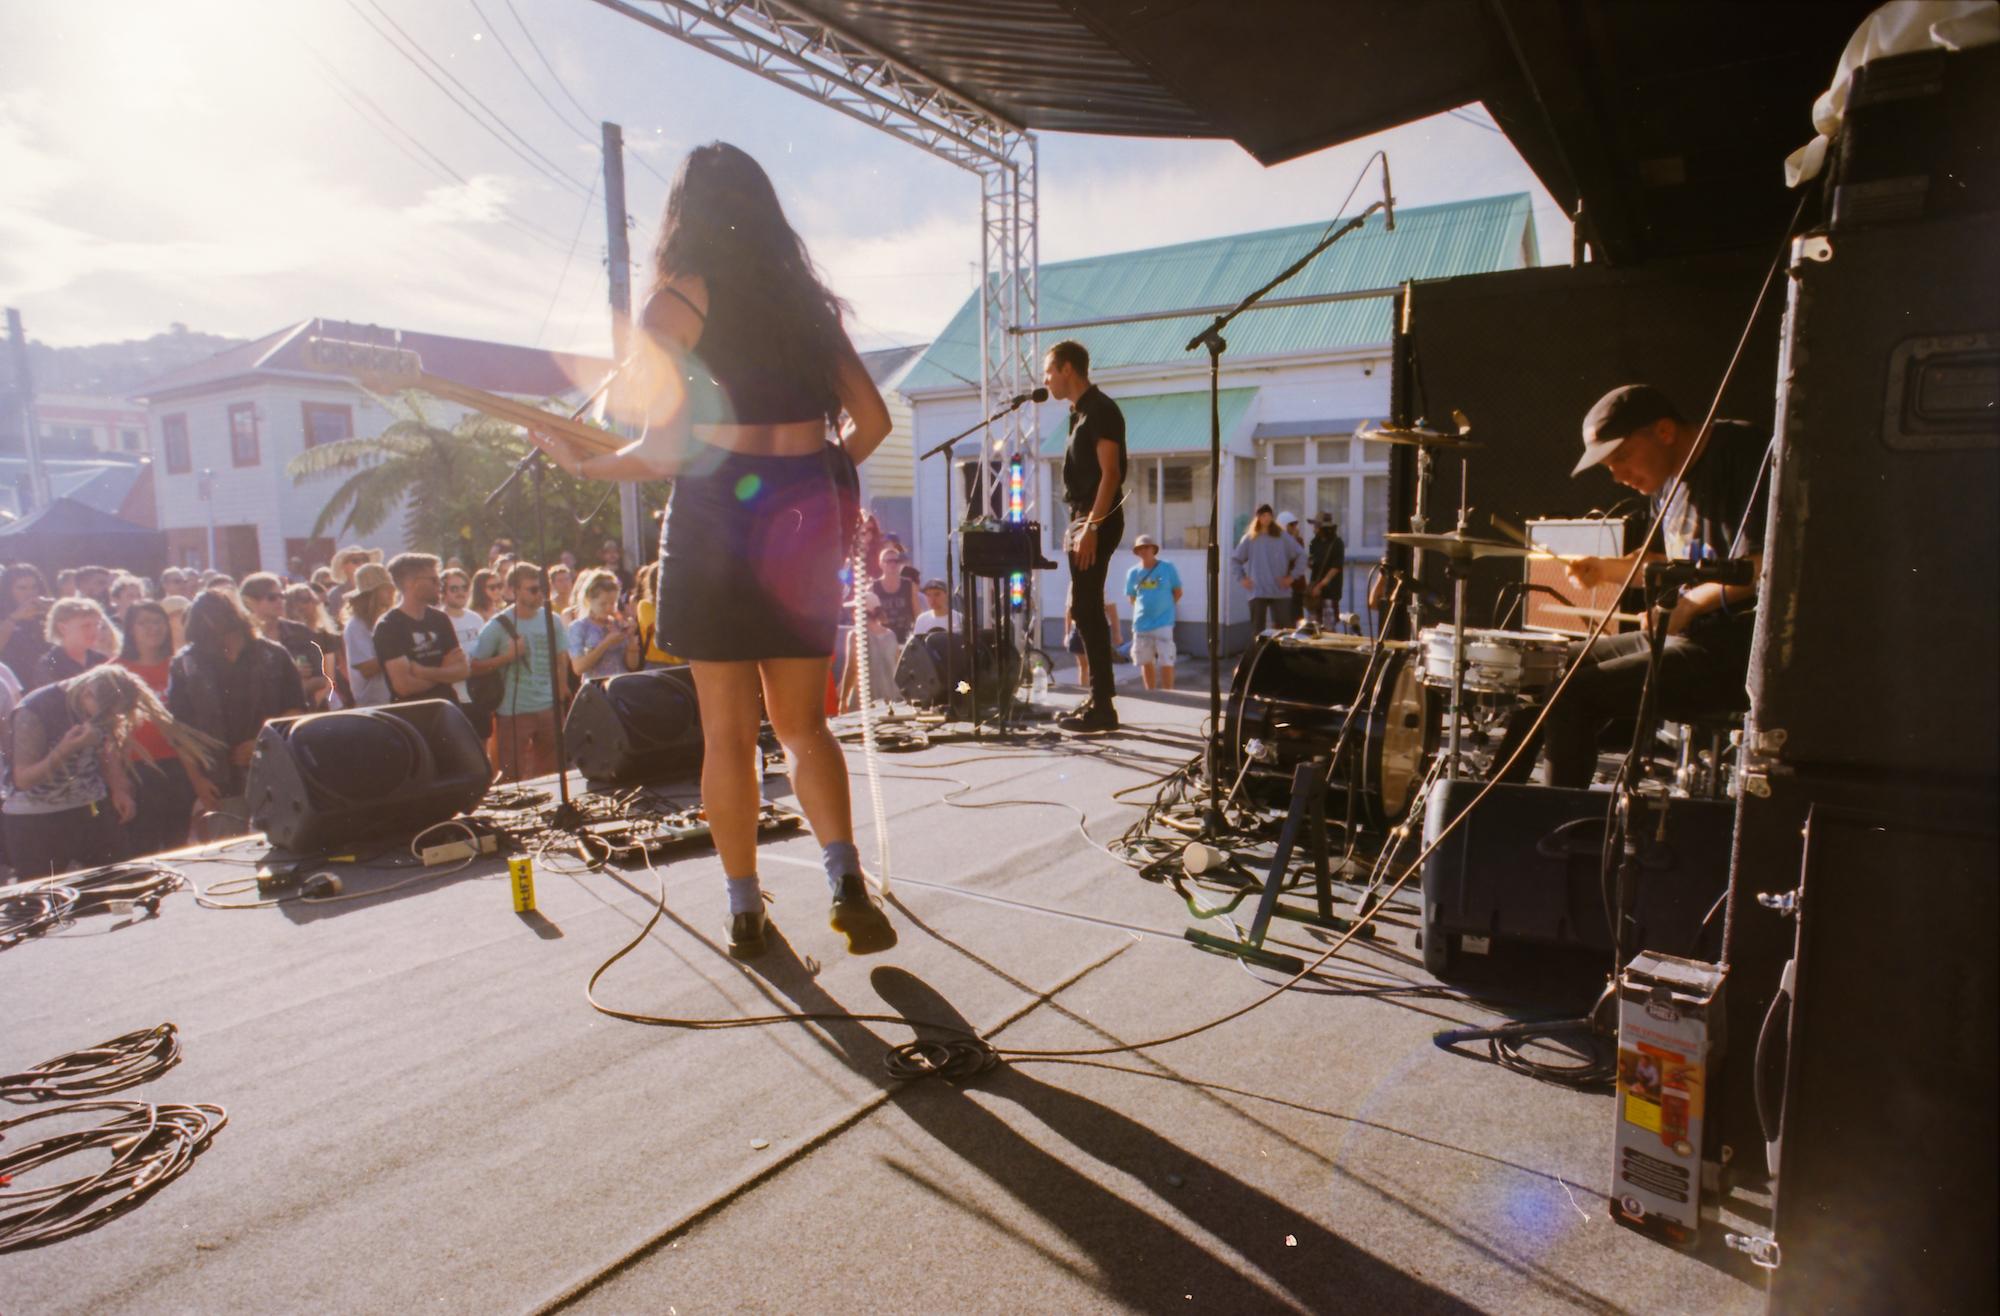 Newtown Festival. Nikon FE2, Nikkor 20mm f3.5. Ektar 100 35mm film